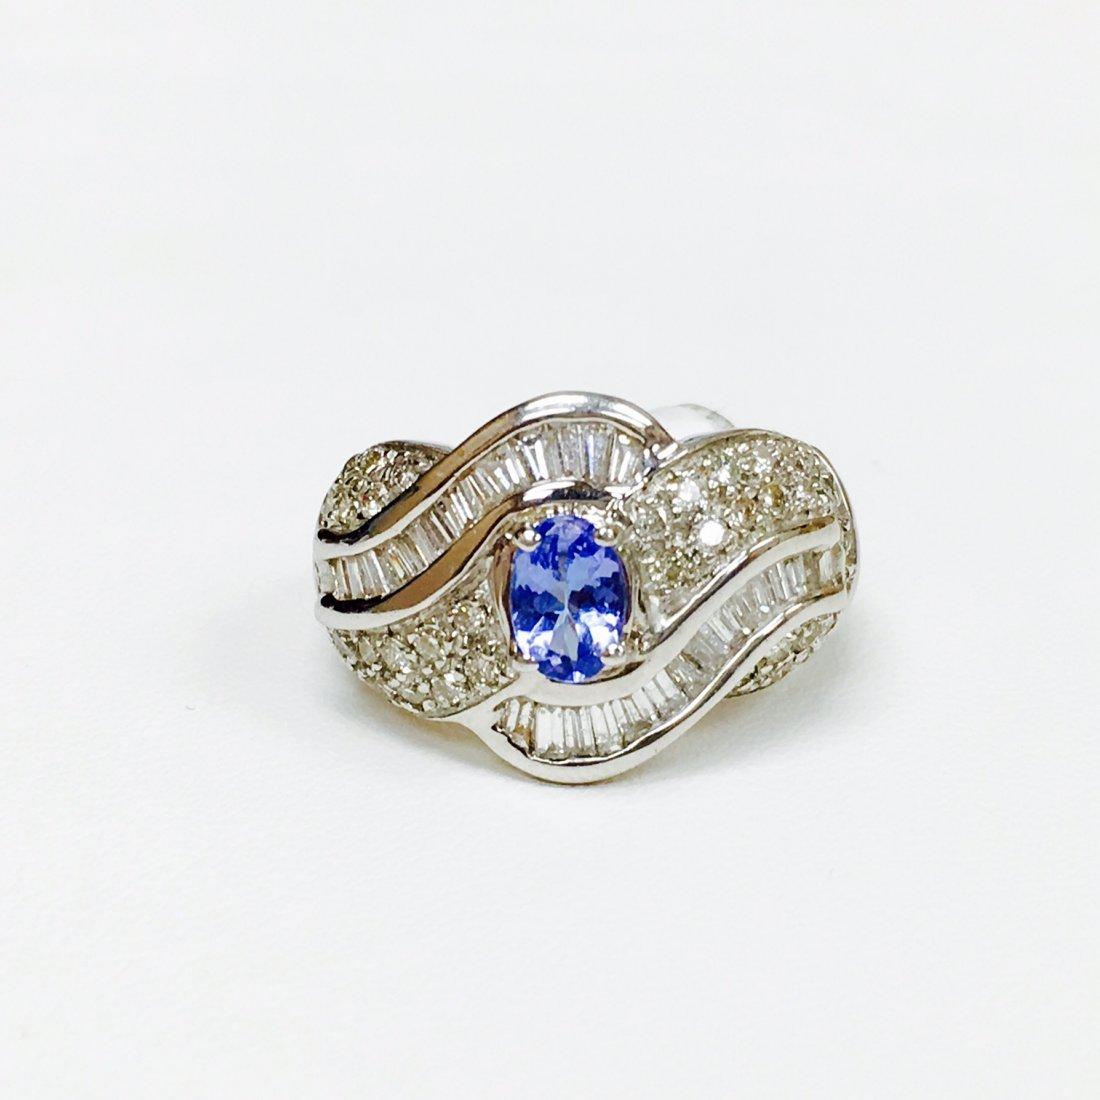 1.75 Carat Diamond and Blue Sapphire Ring